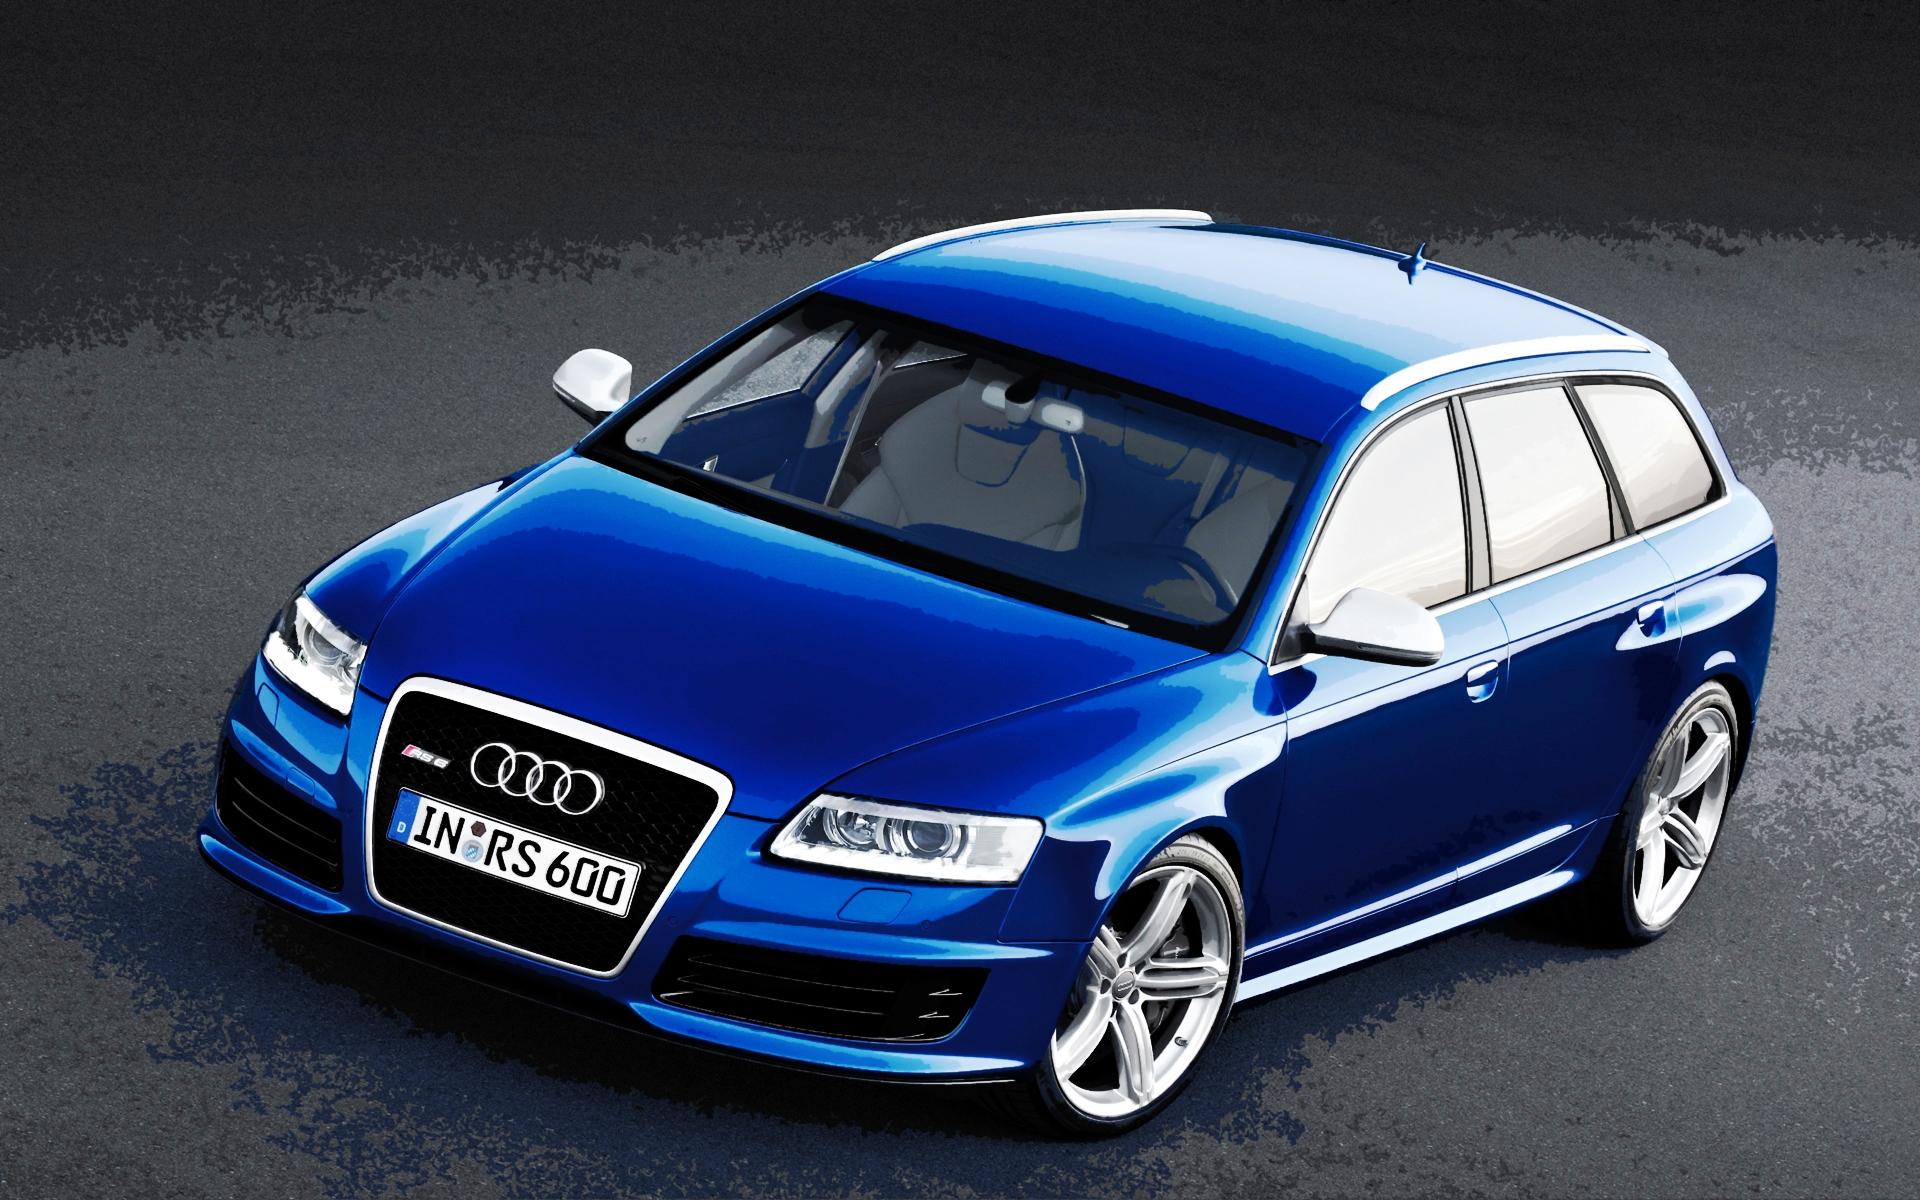 AUDI RS 6 blue